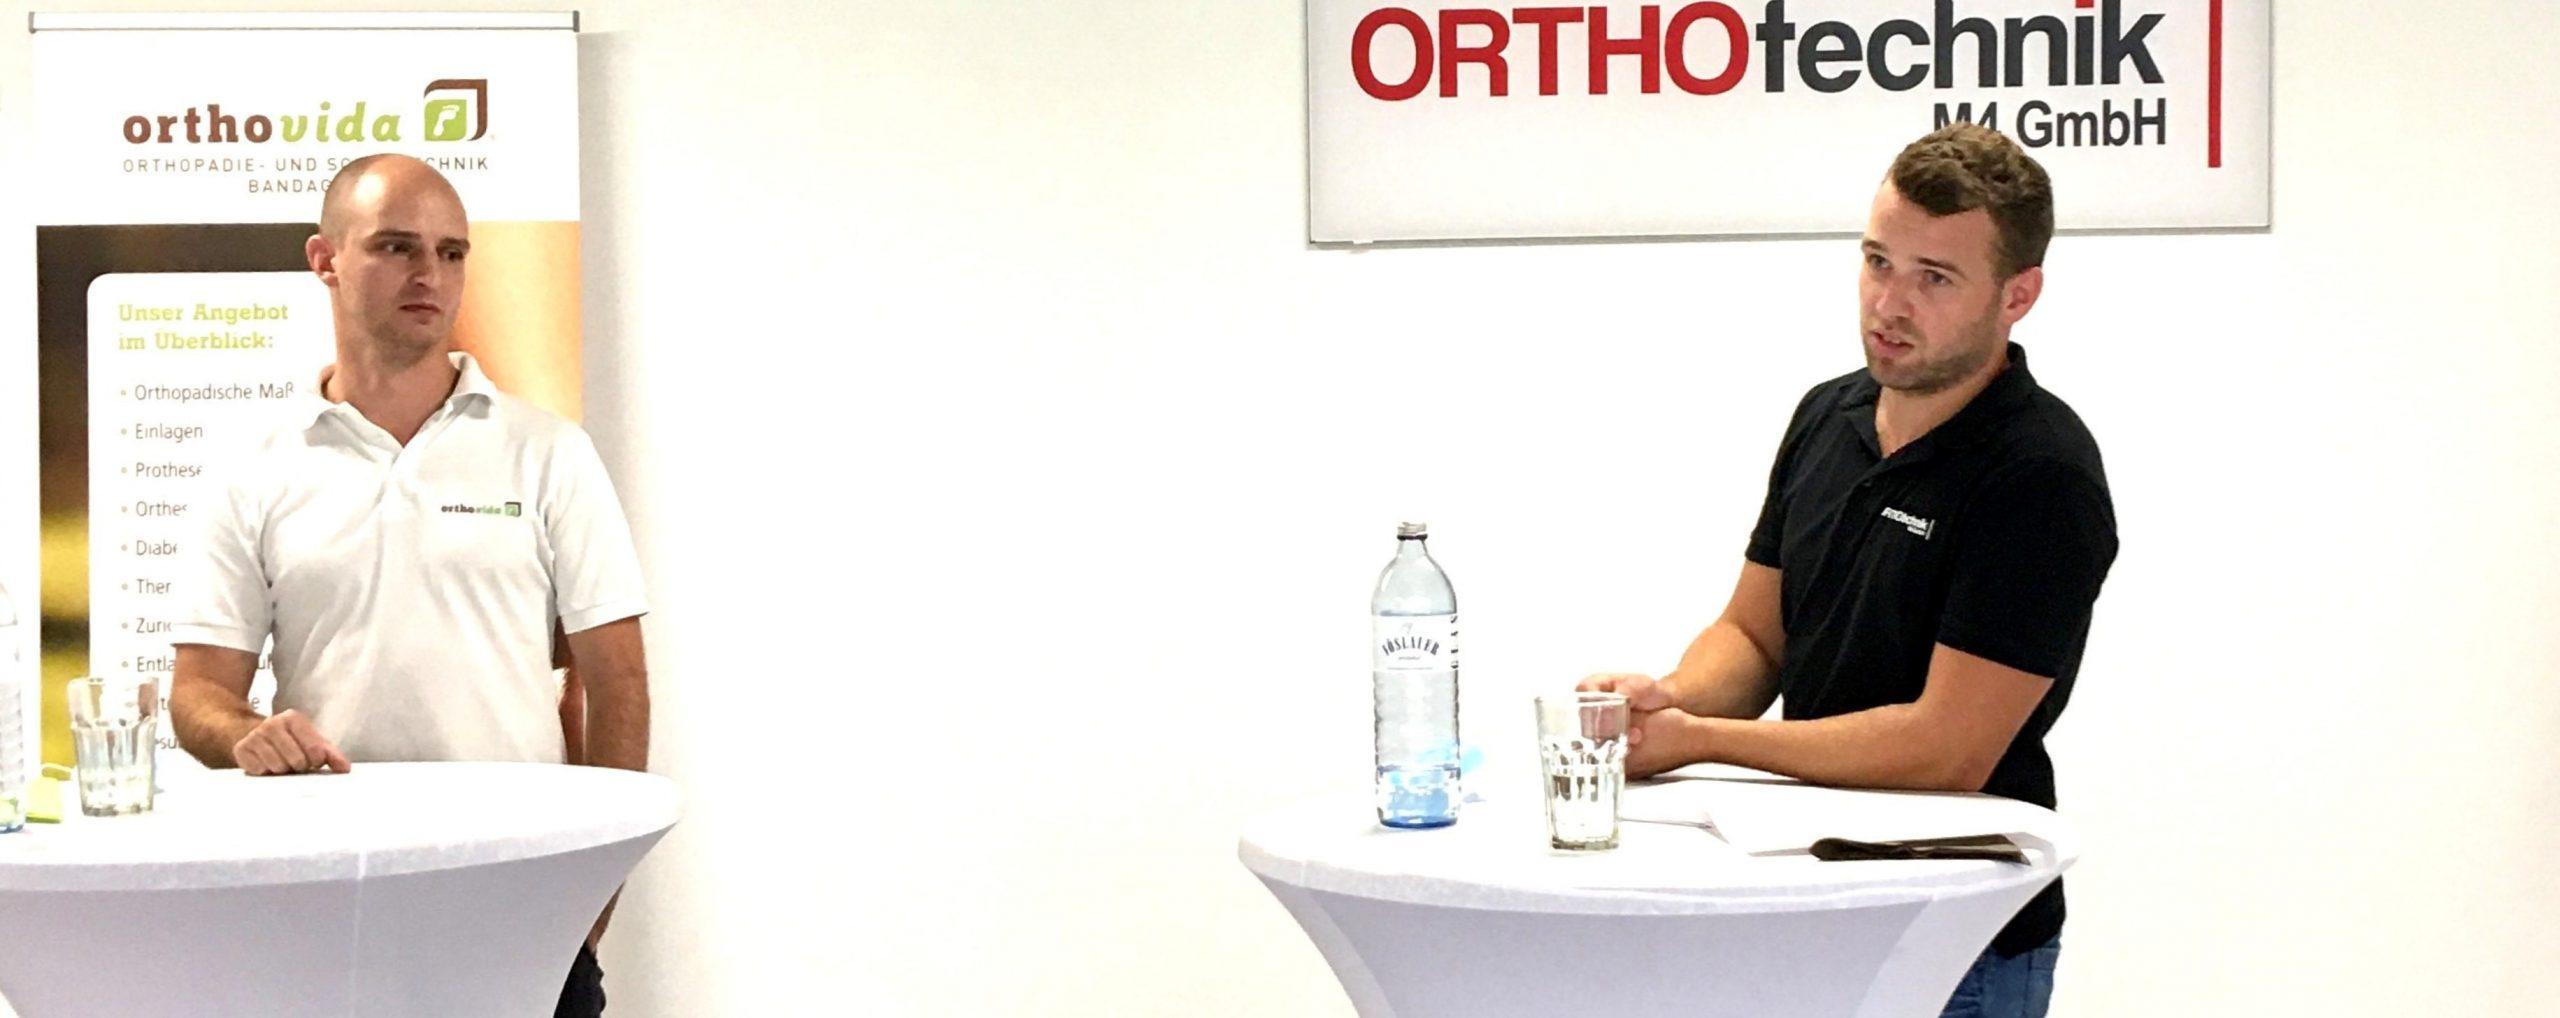 ORTHOtechnik_Titelbild_News_Ereignisreiche Wochen